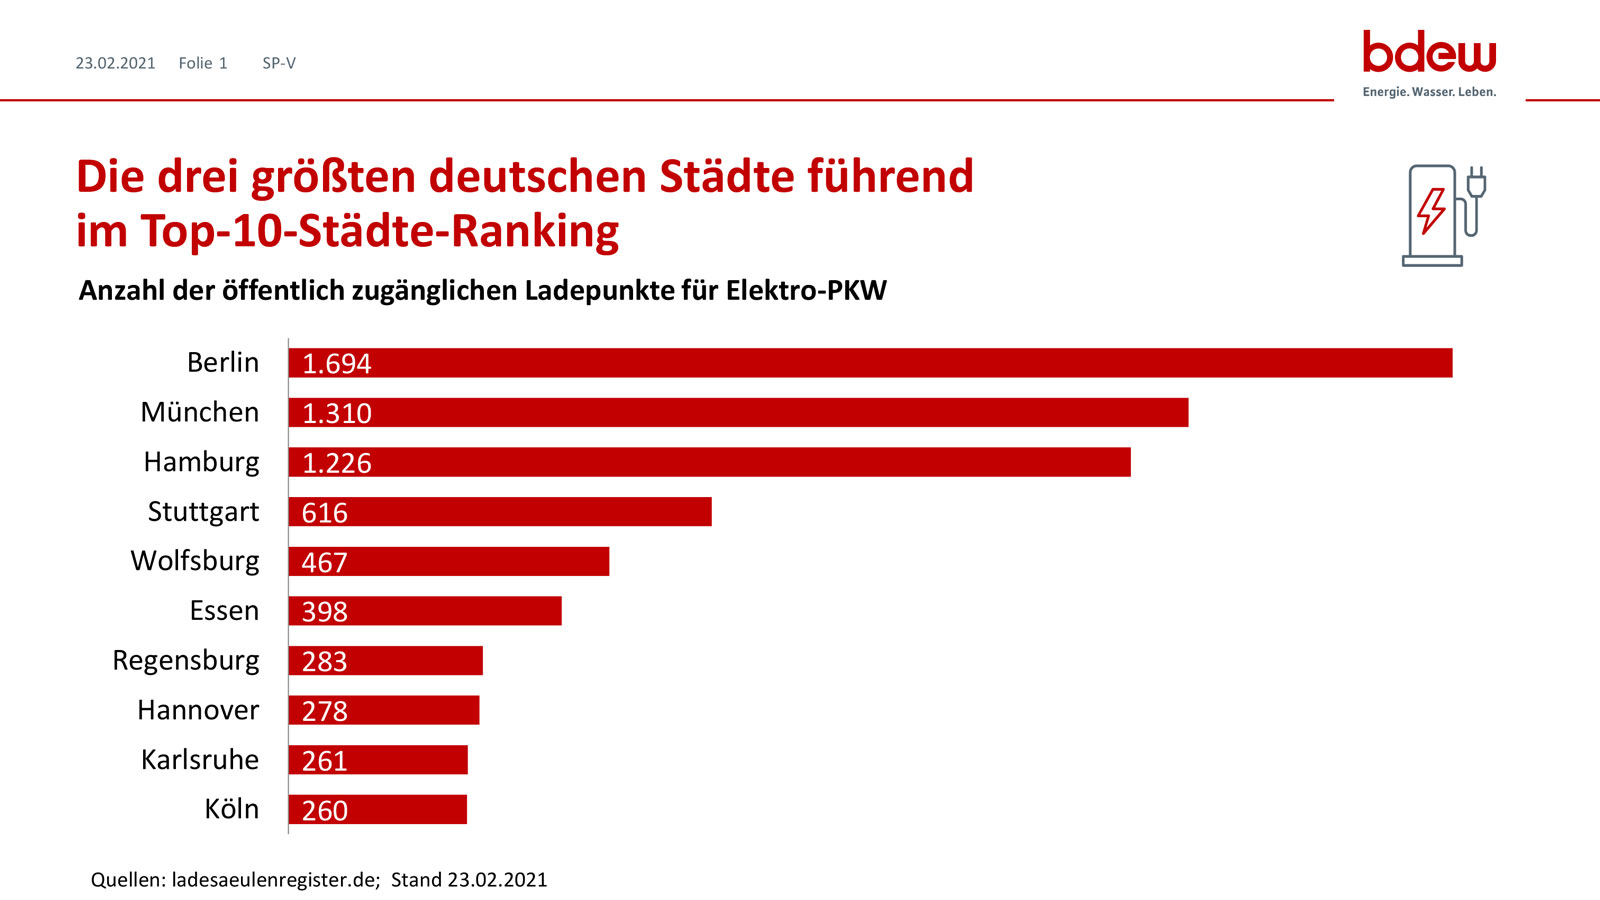 Elektromobilitaet_Ladepunkte_Top-10_Staedteranking